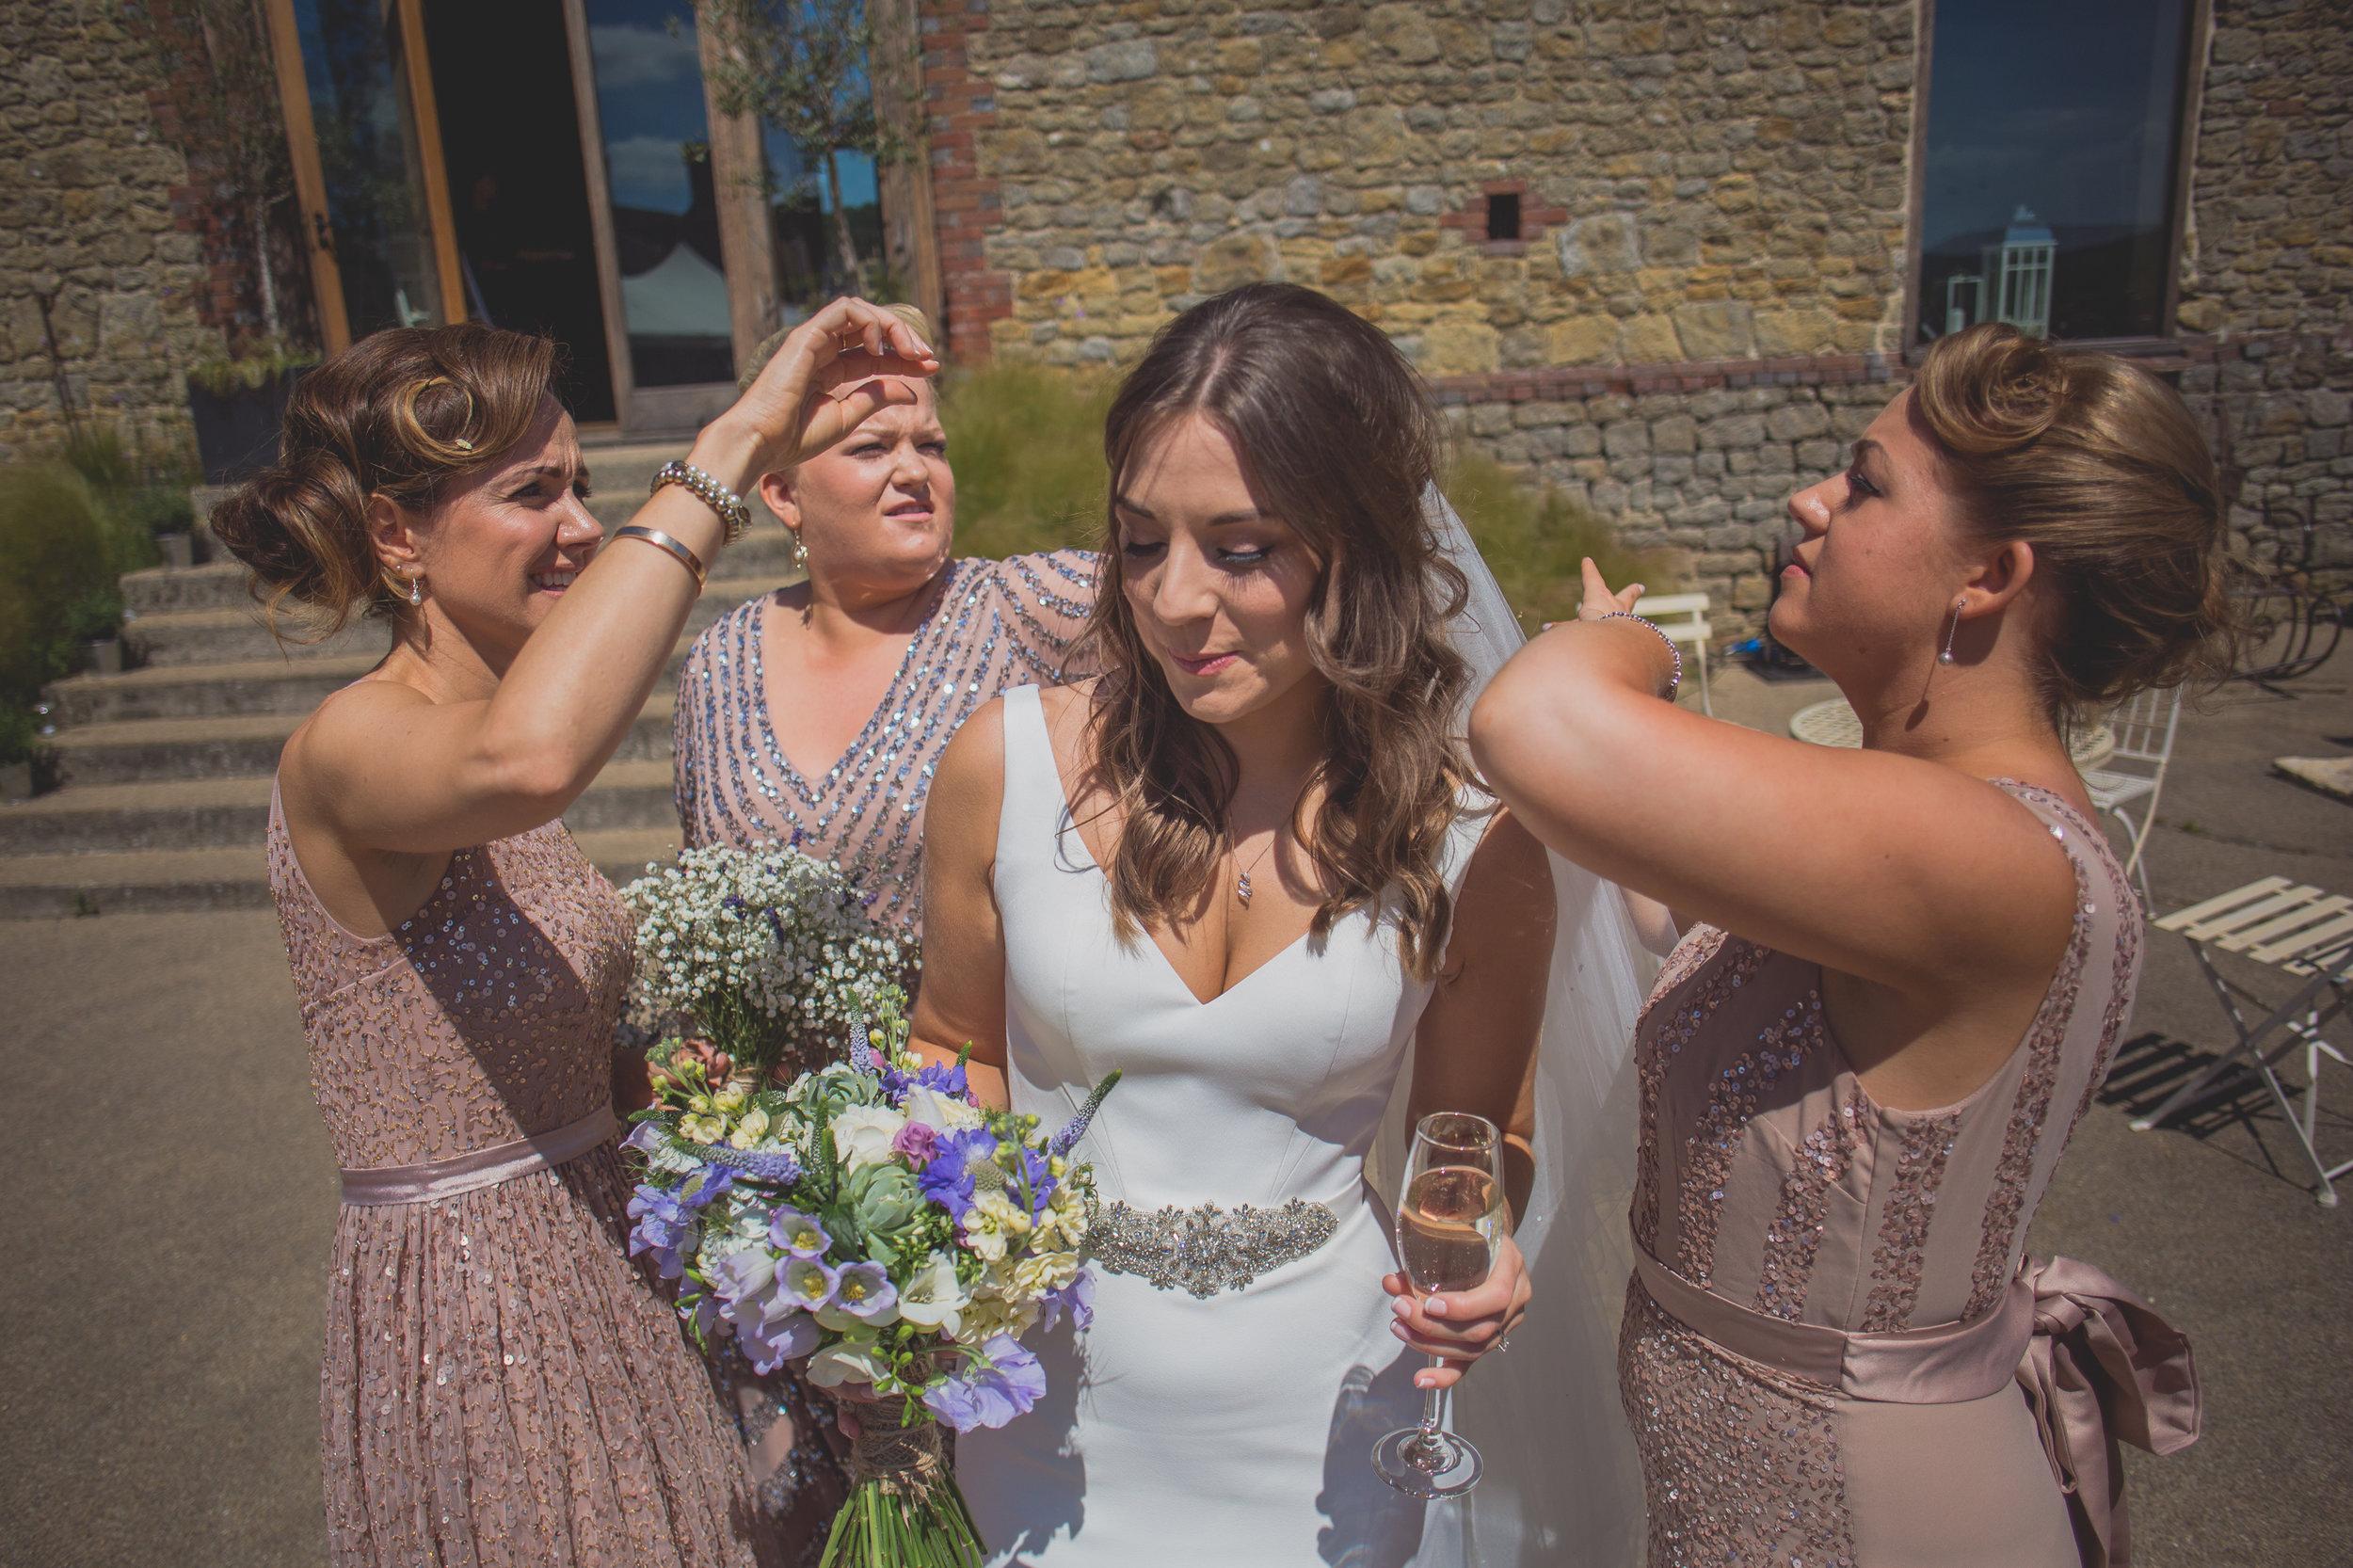 Grittenham Barn female wedding photographers west sussex petworth social-81.jpg